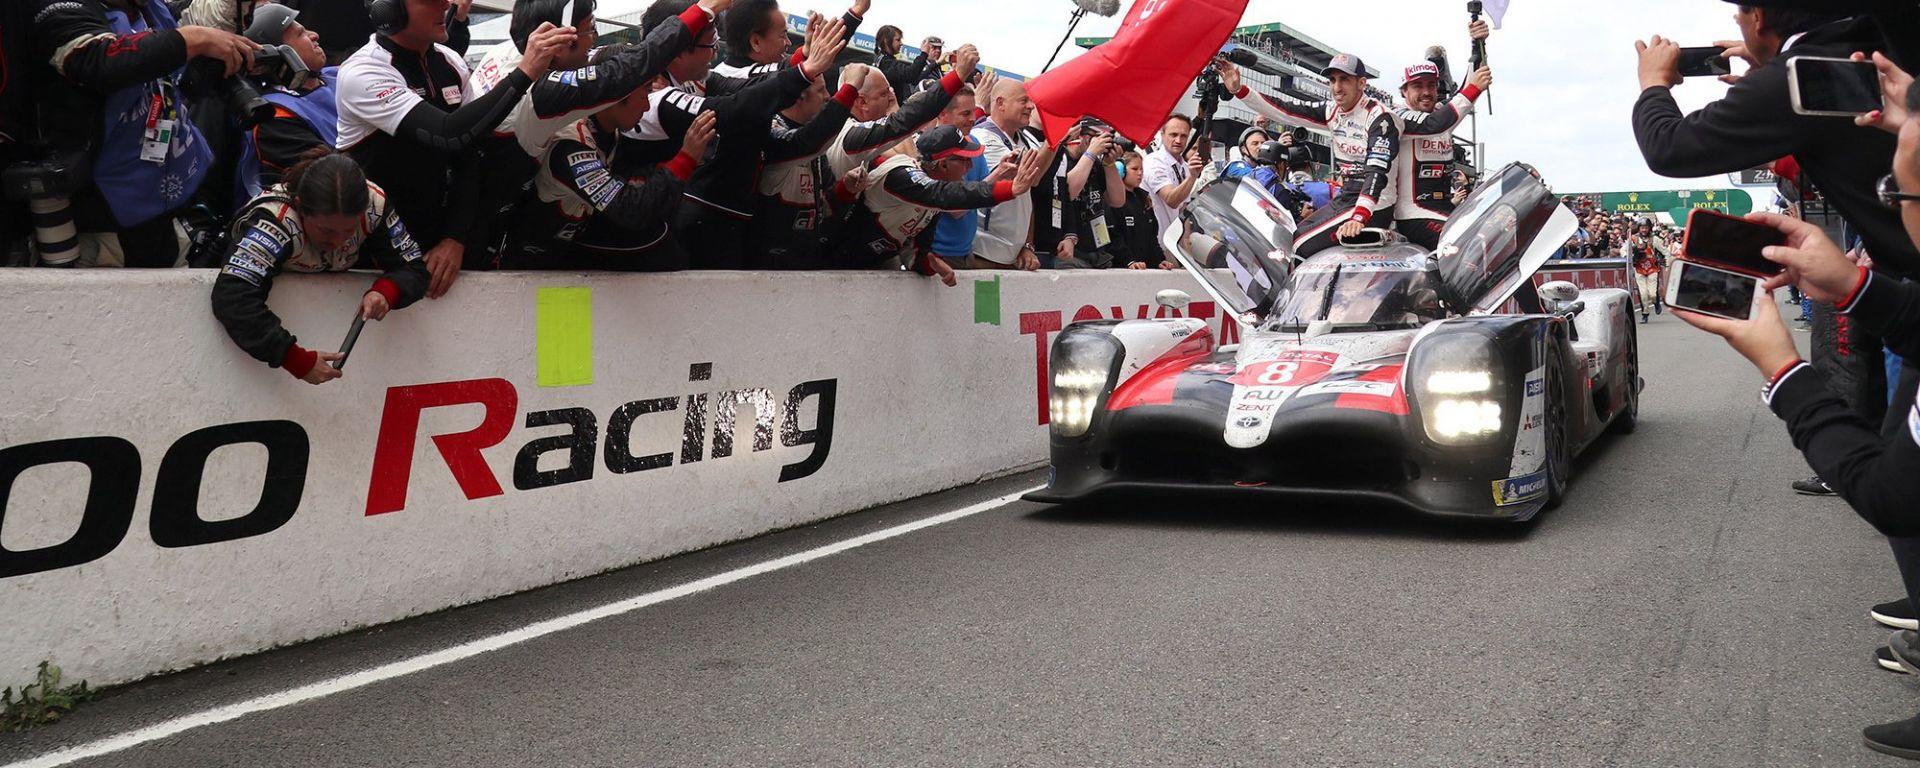 24H Le Mans 2019: 1-2 Toyota, Alonso vince gara e titolo Wec